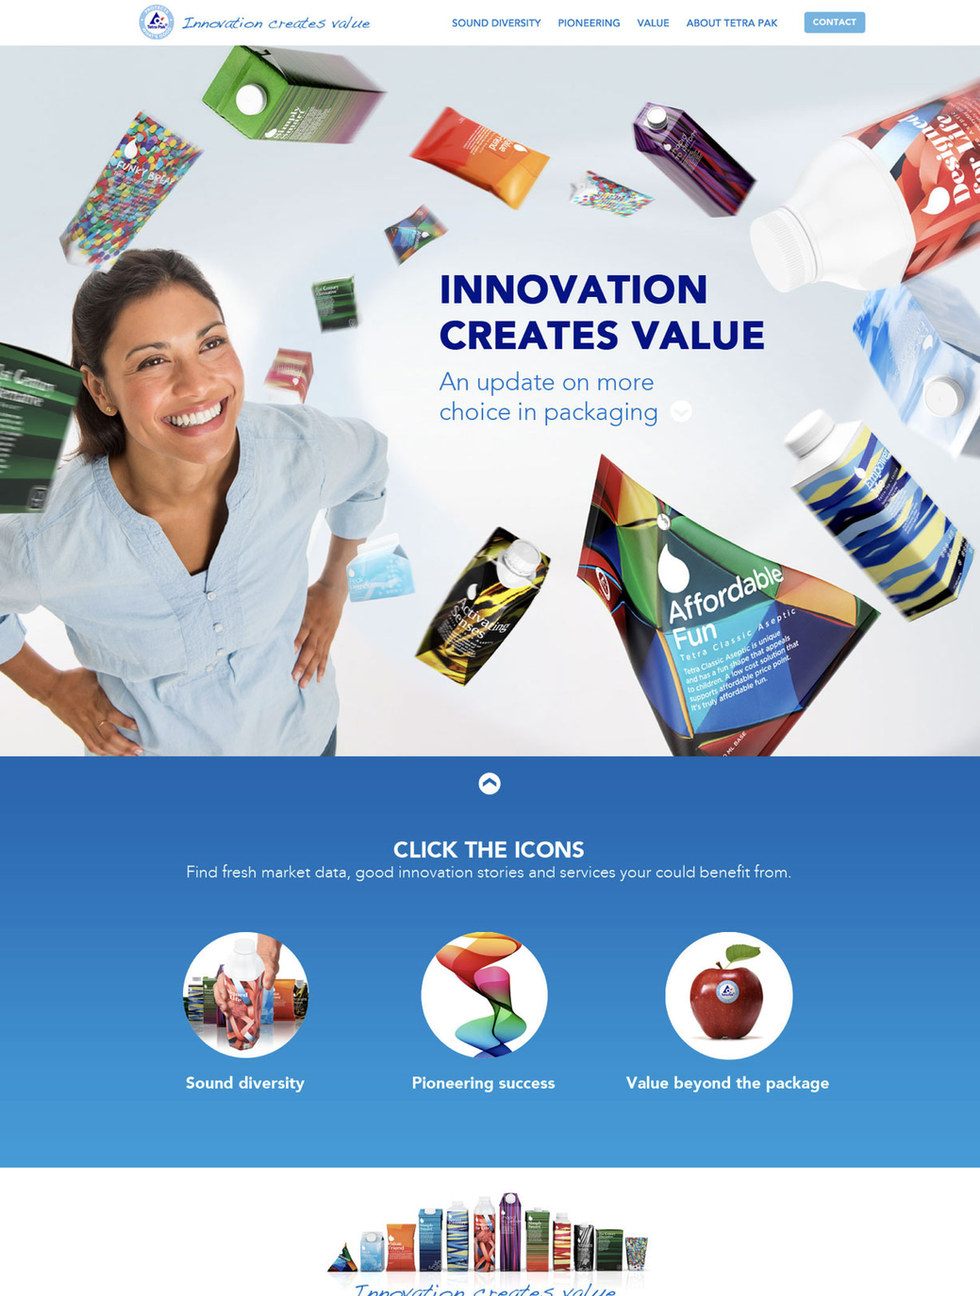 Innovation creates Value